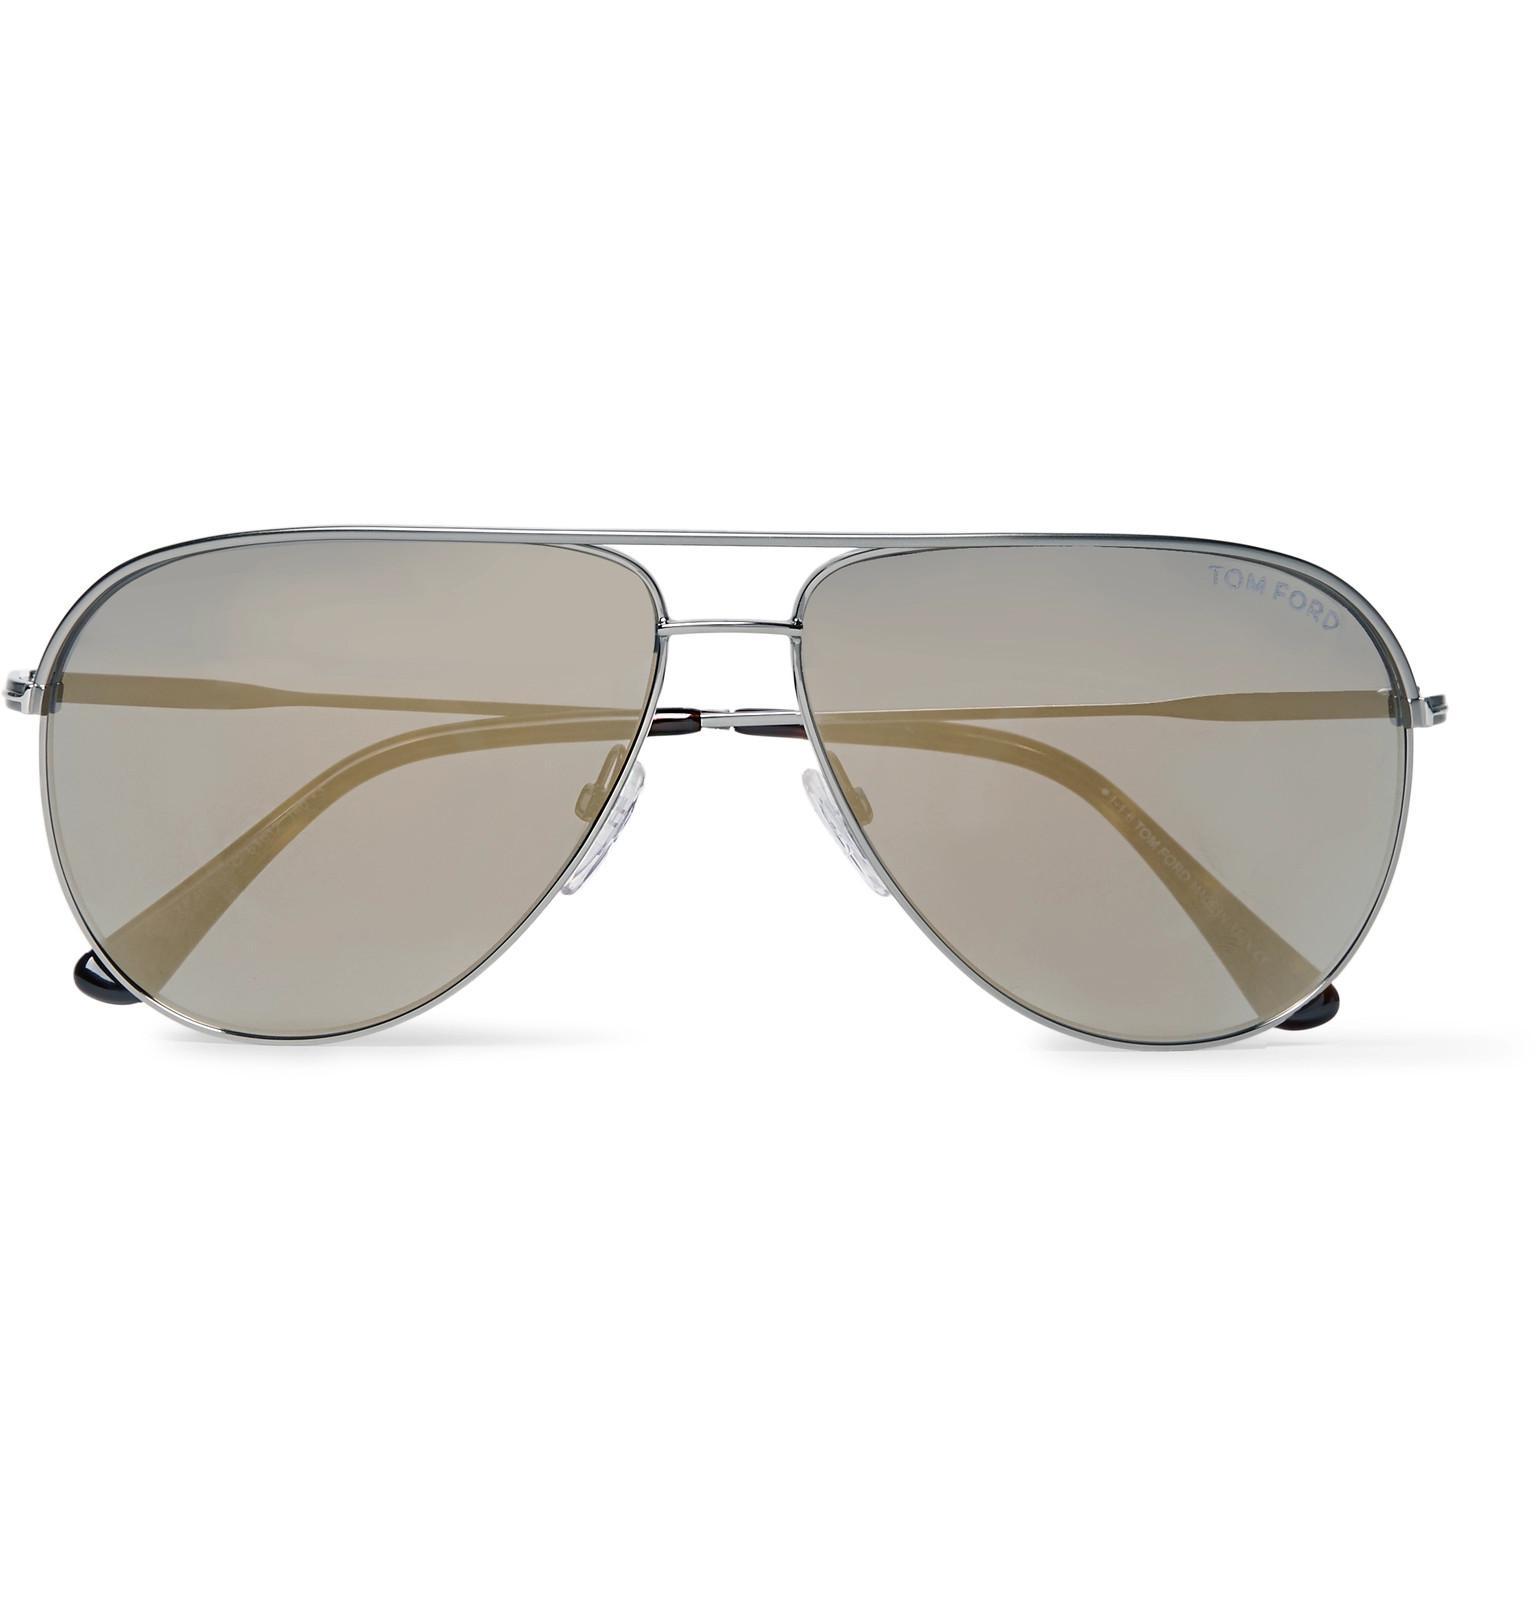 Tom Aviator Erin Lyst Sunglasses Style In Gunmetal Tone Ford tdqnxwCz